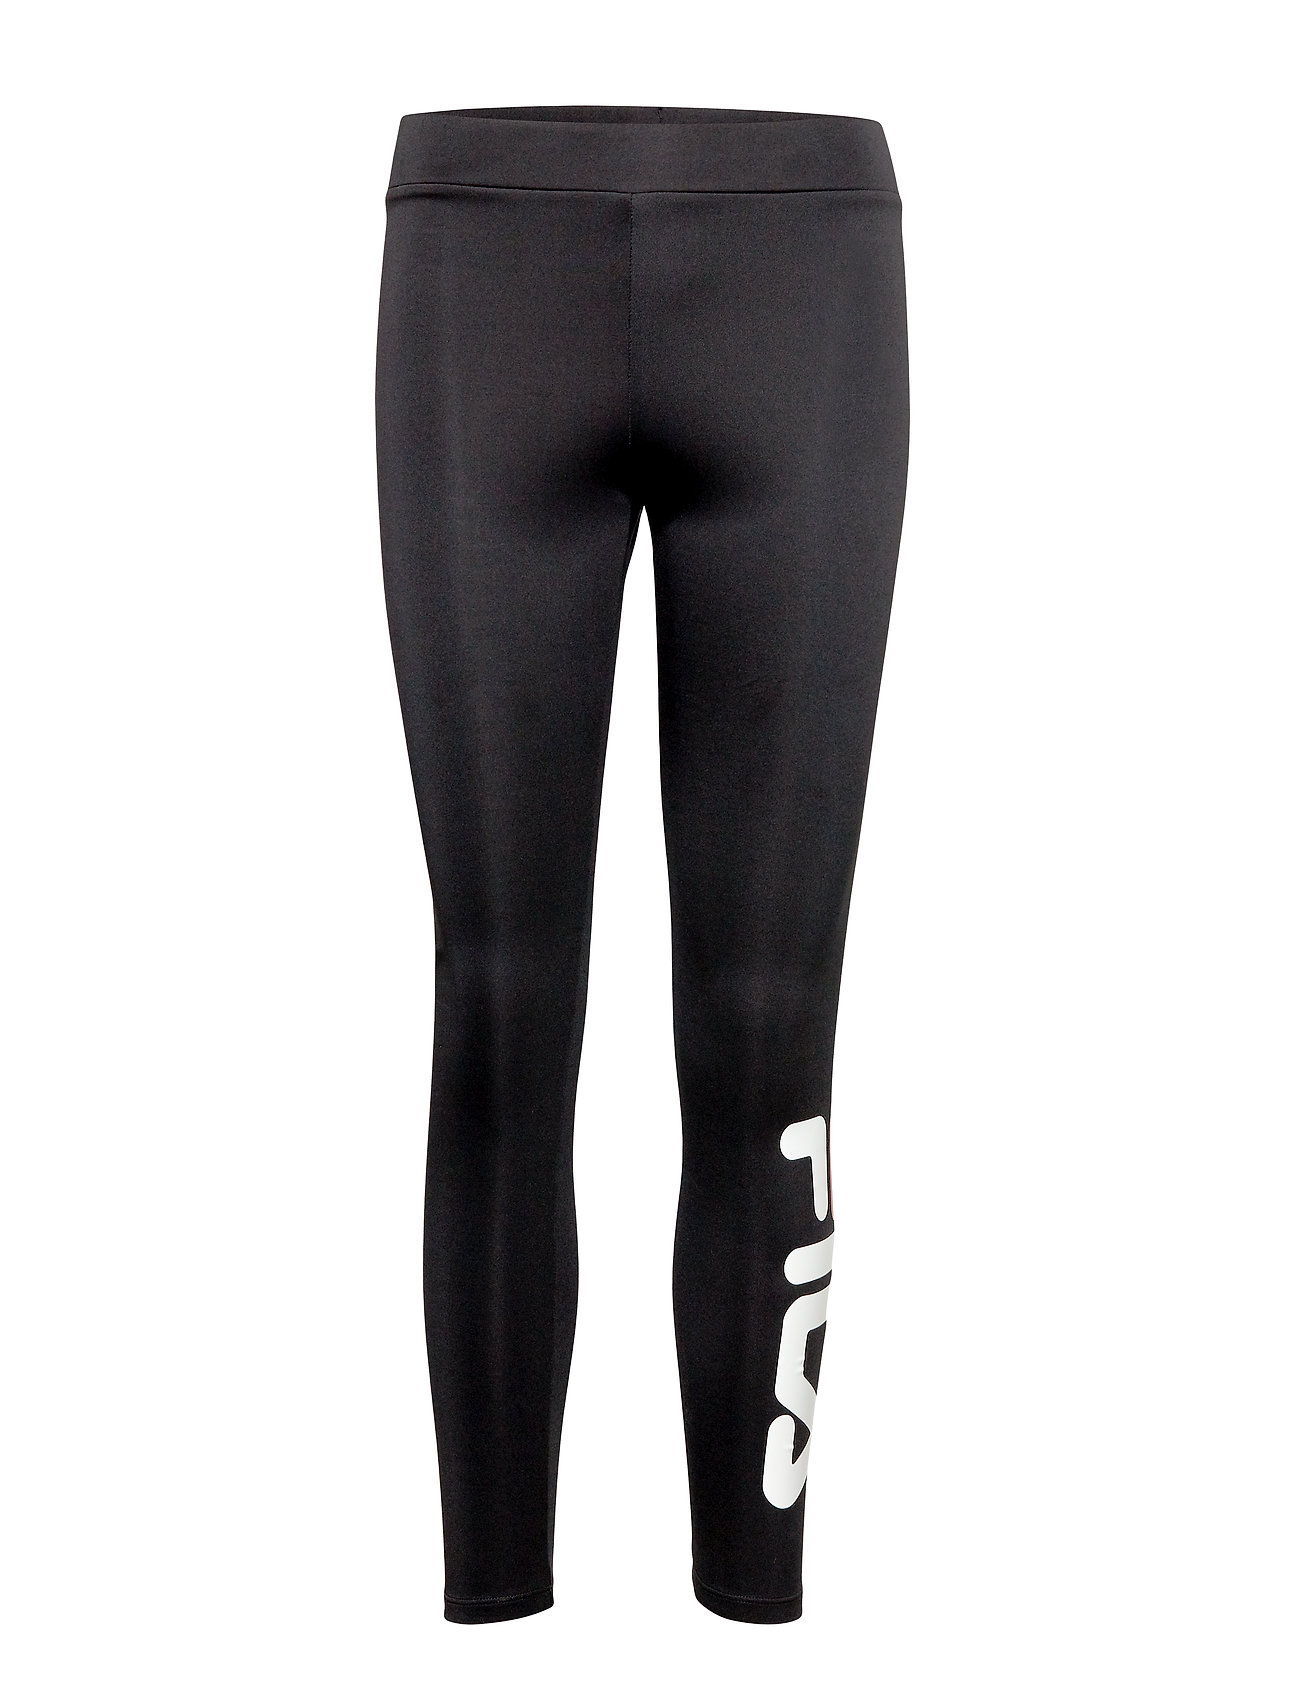 FILA FLEX 2.0 leggings